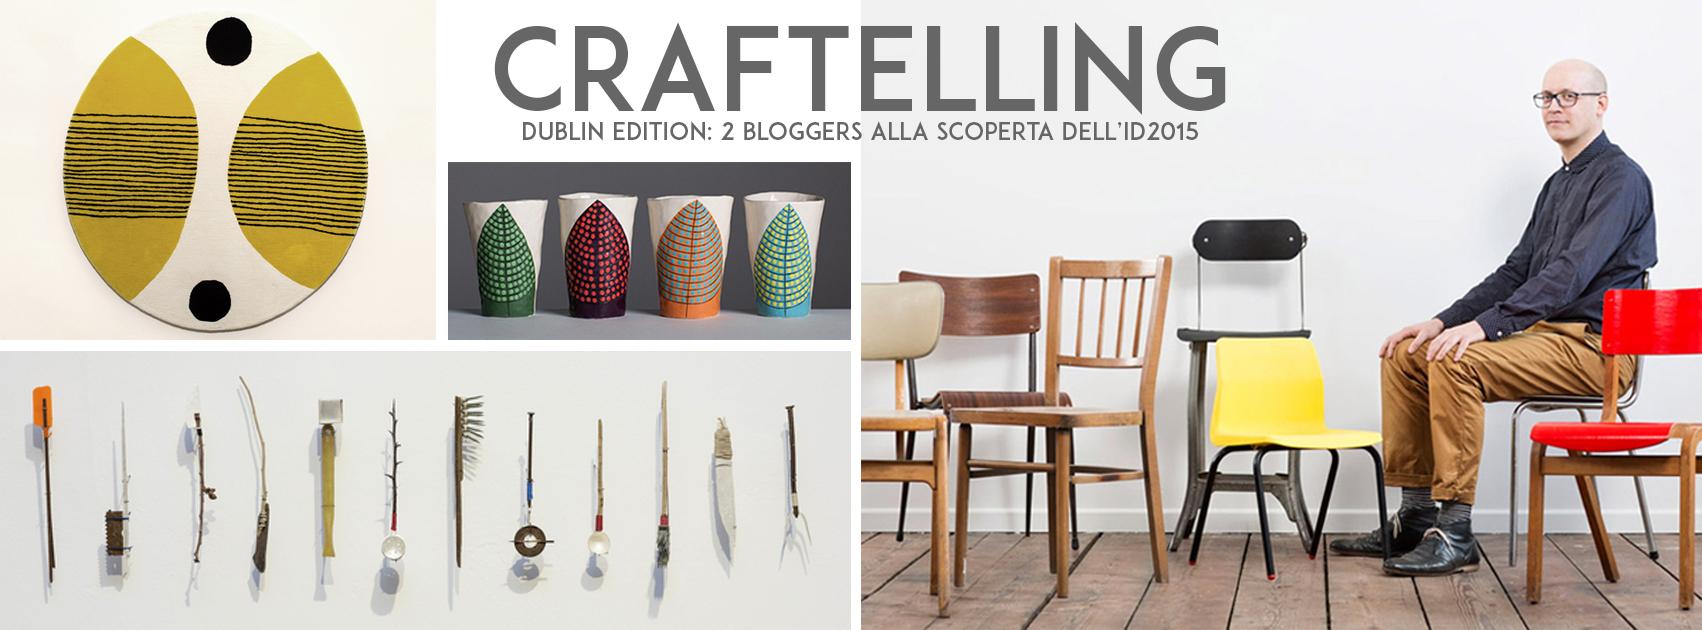 craftelling-FB